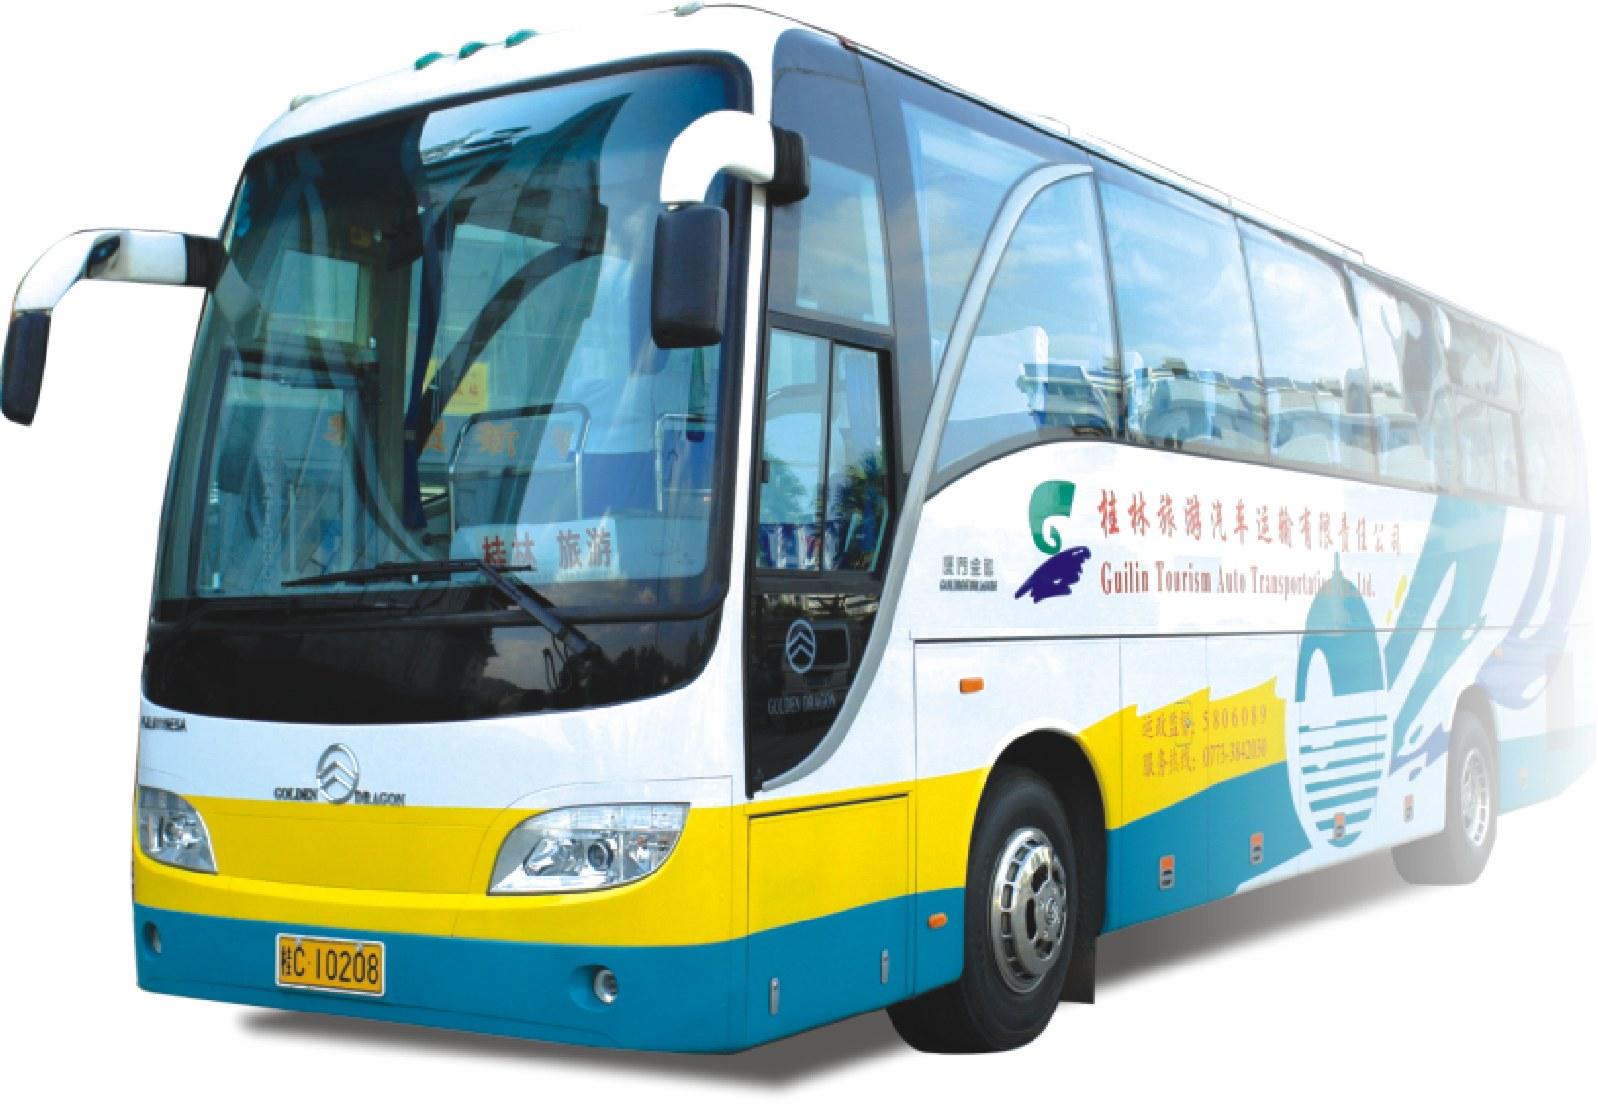 Guilin Transport